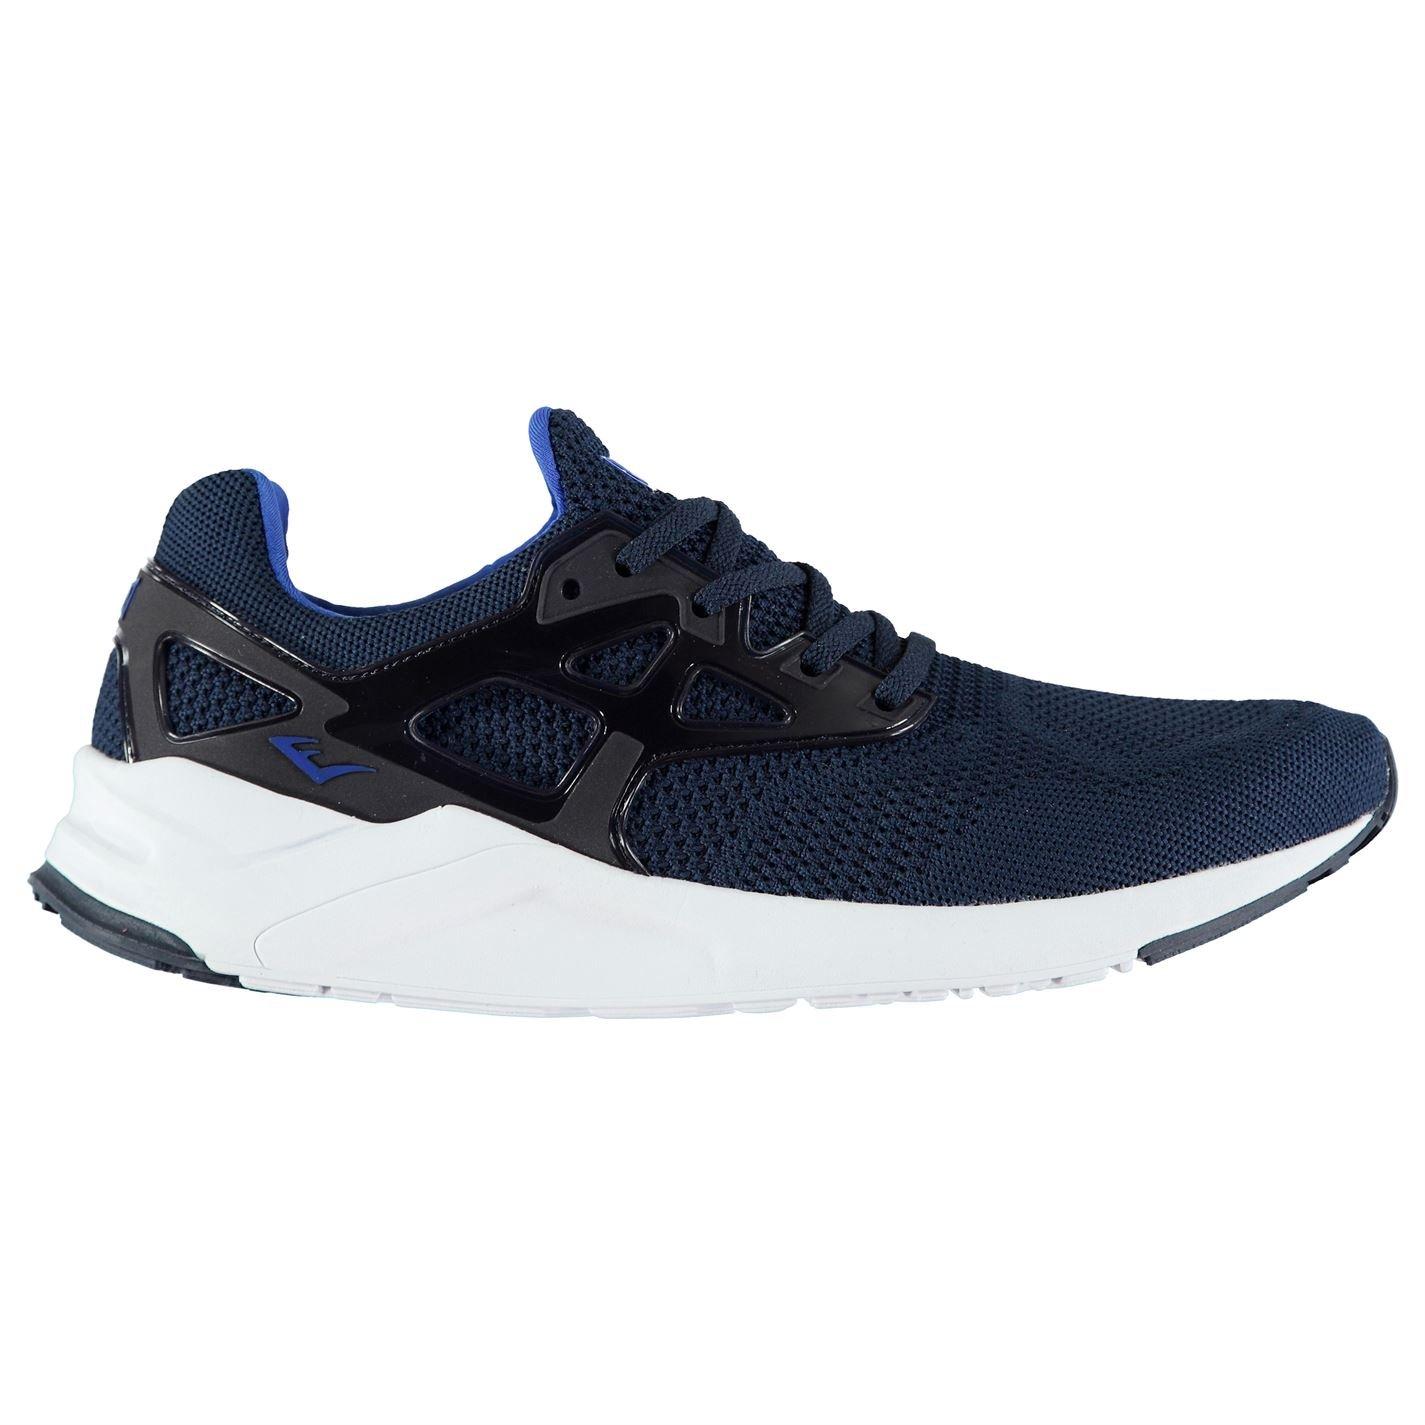 blueee 7 UK Everlast Tanto Knit Mens Trainers Runners